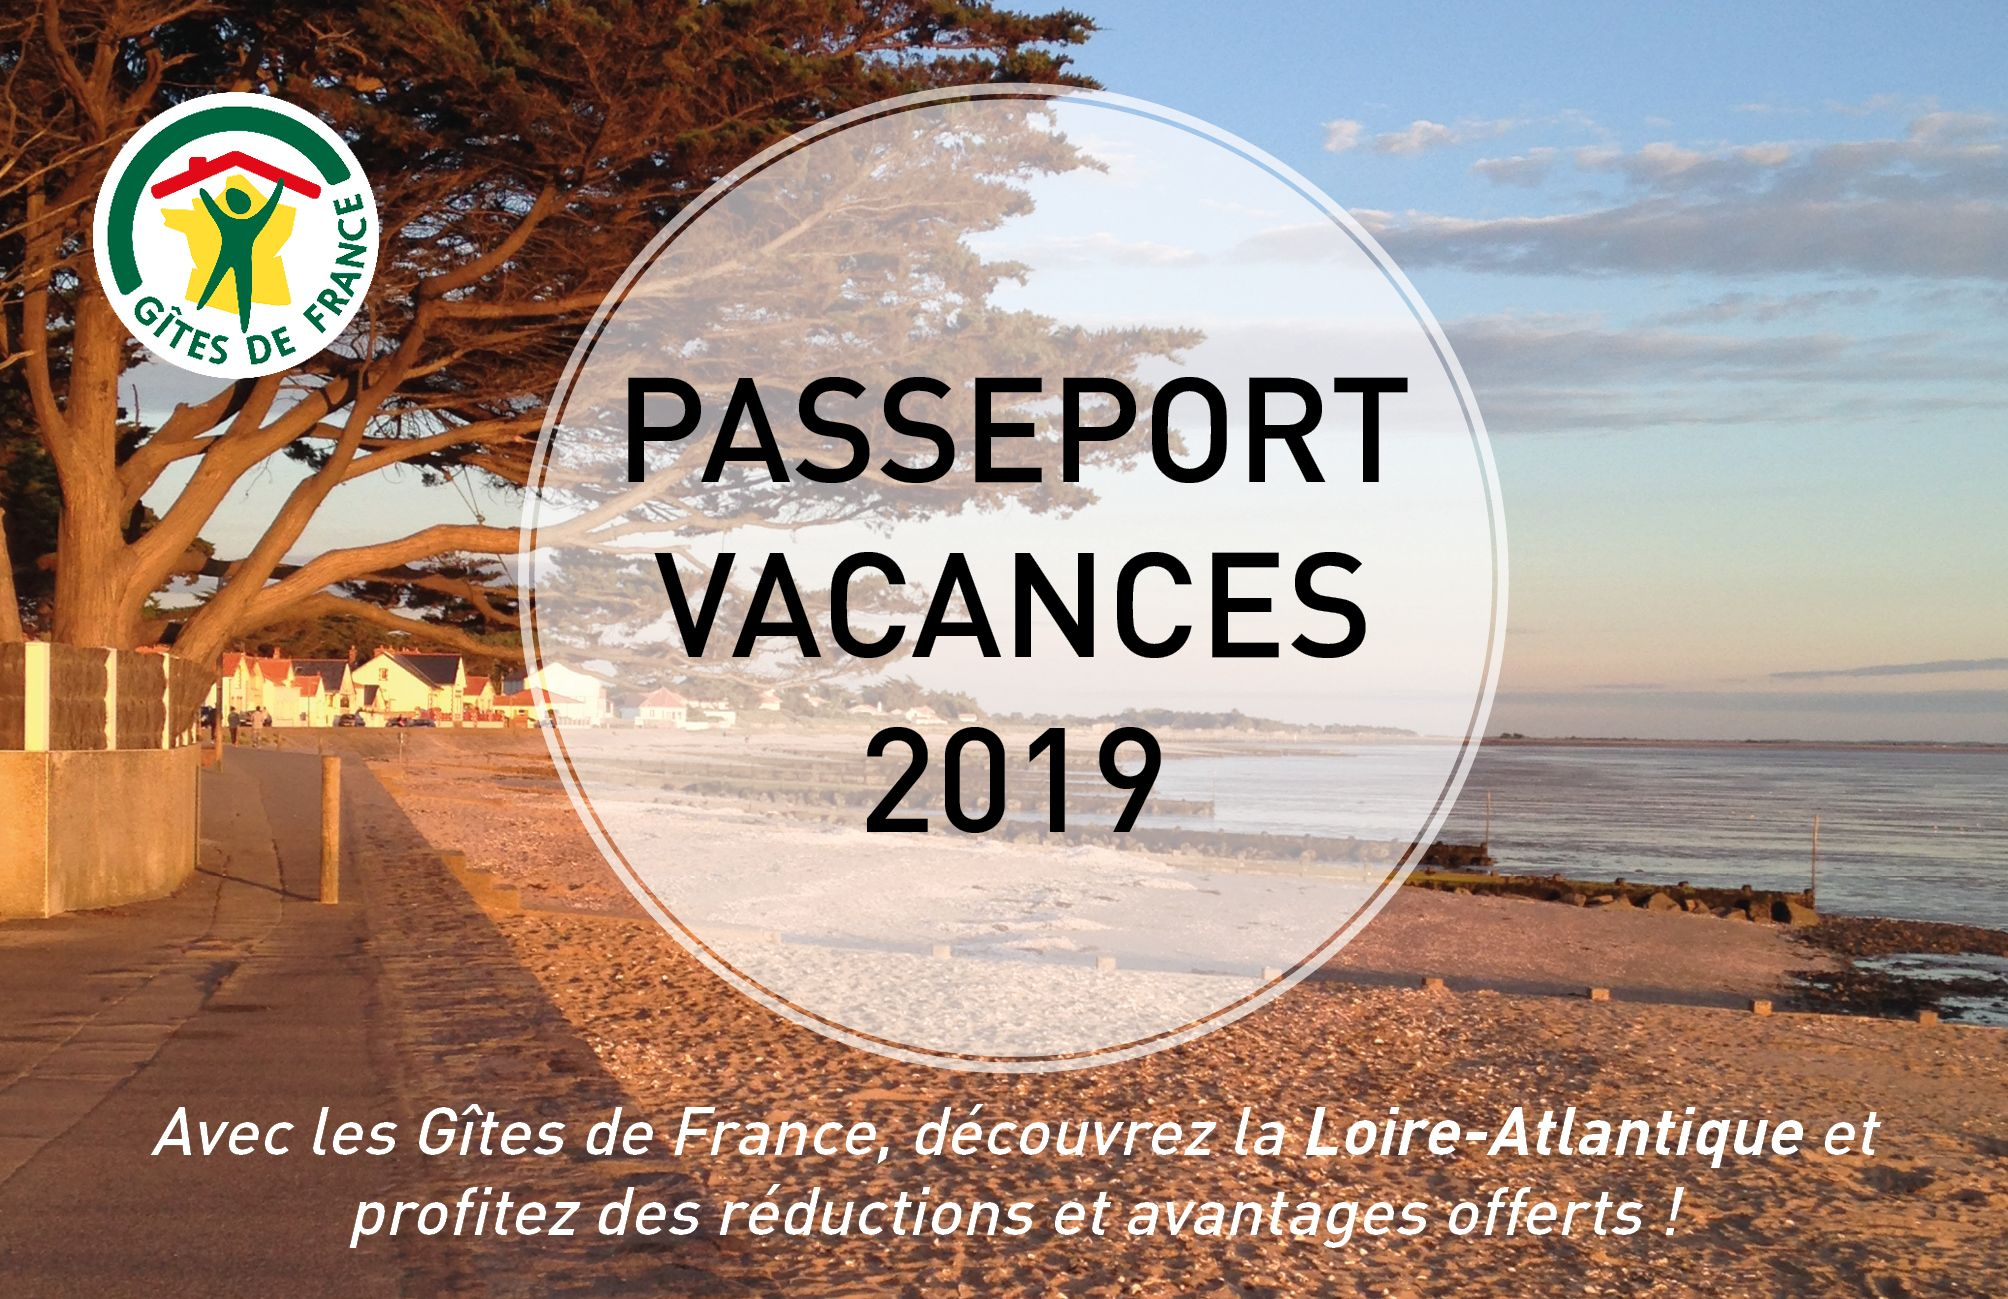 Passeport vacances 2019